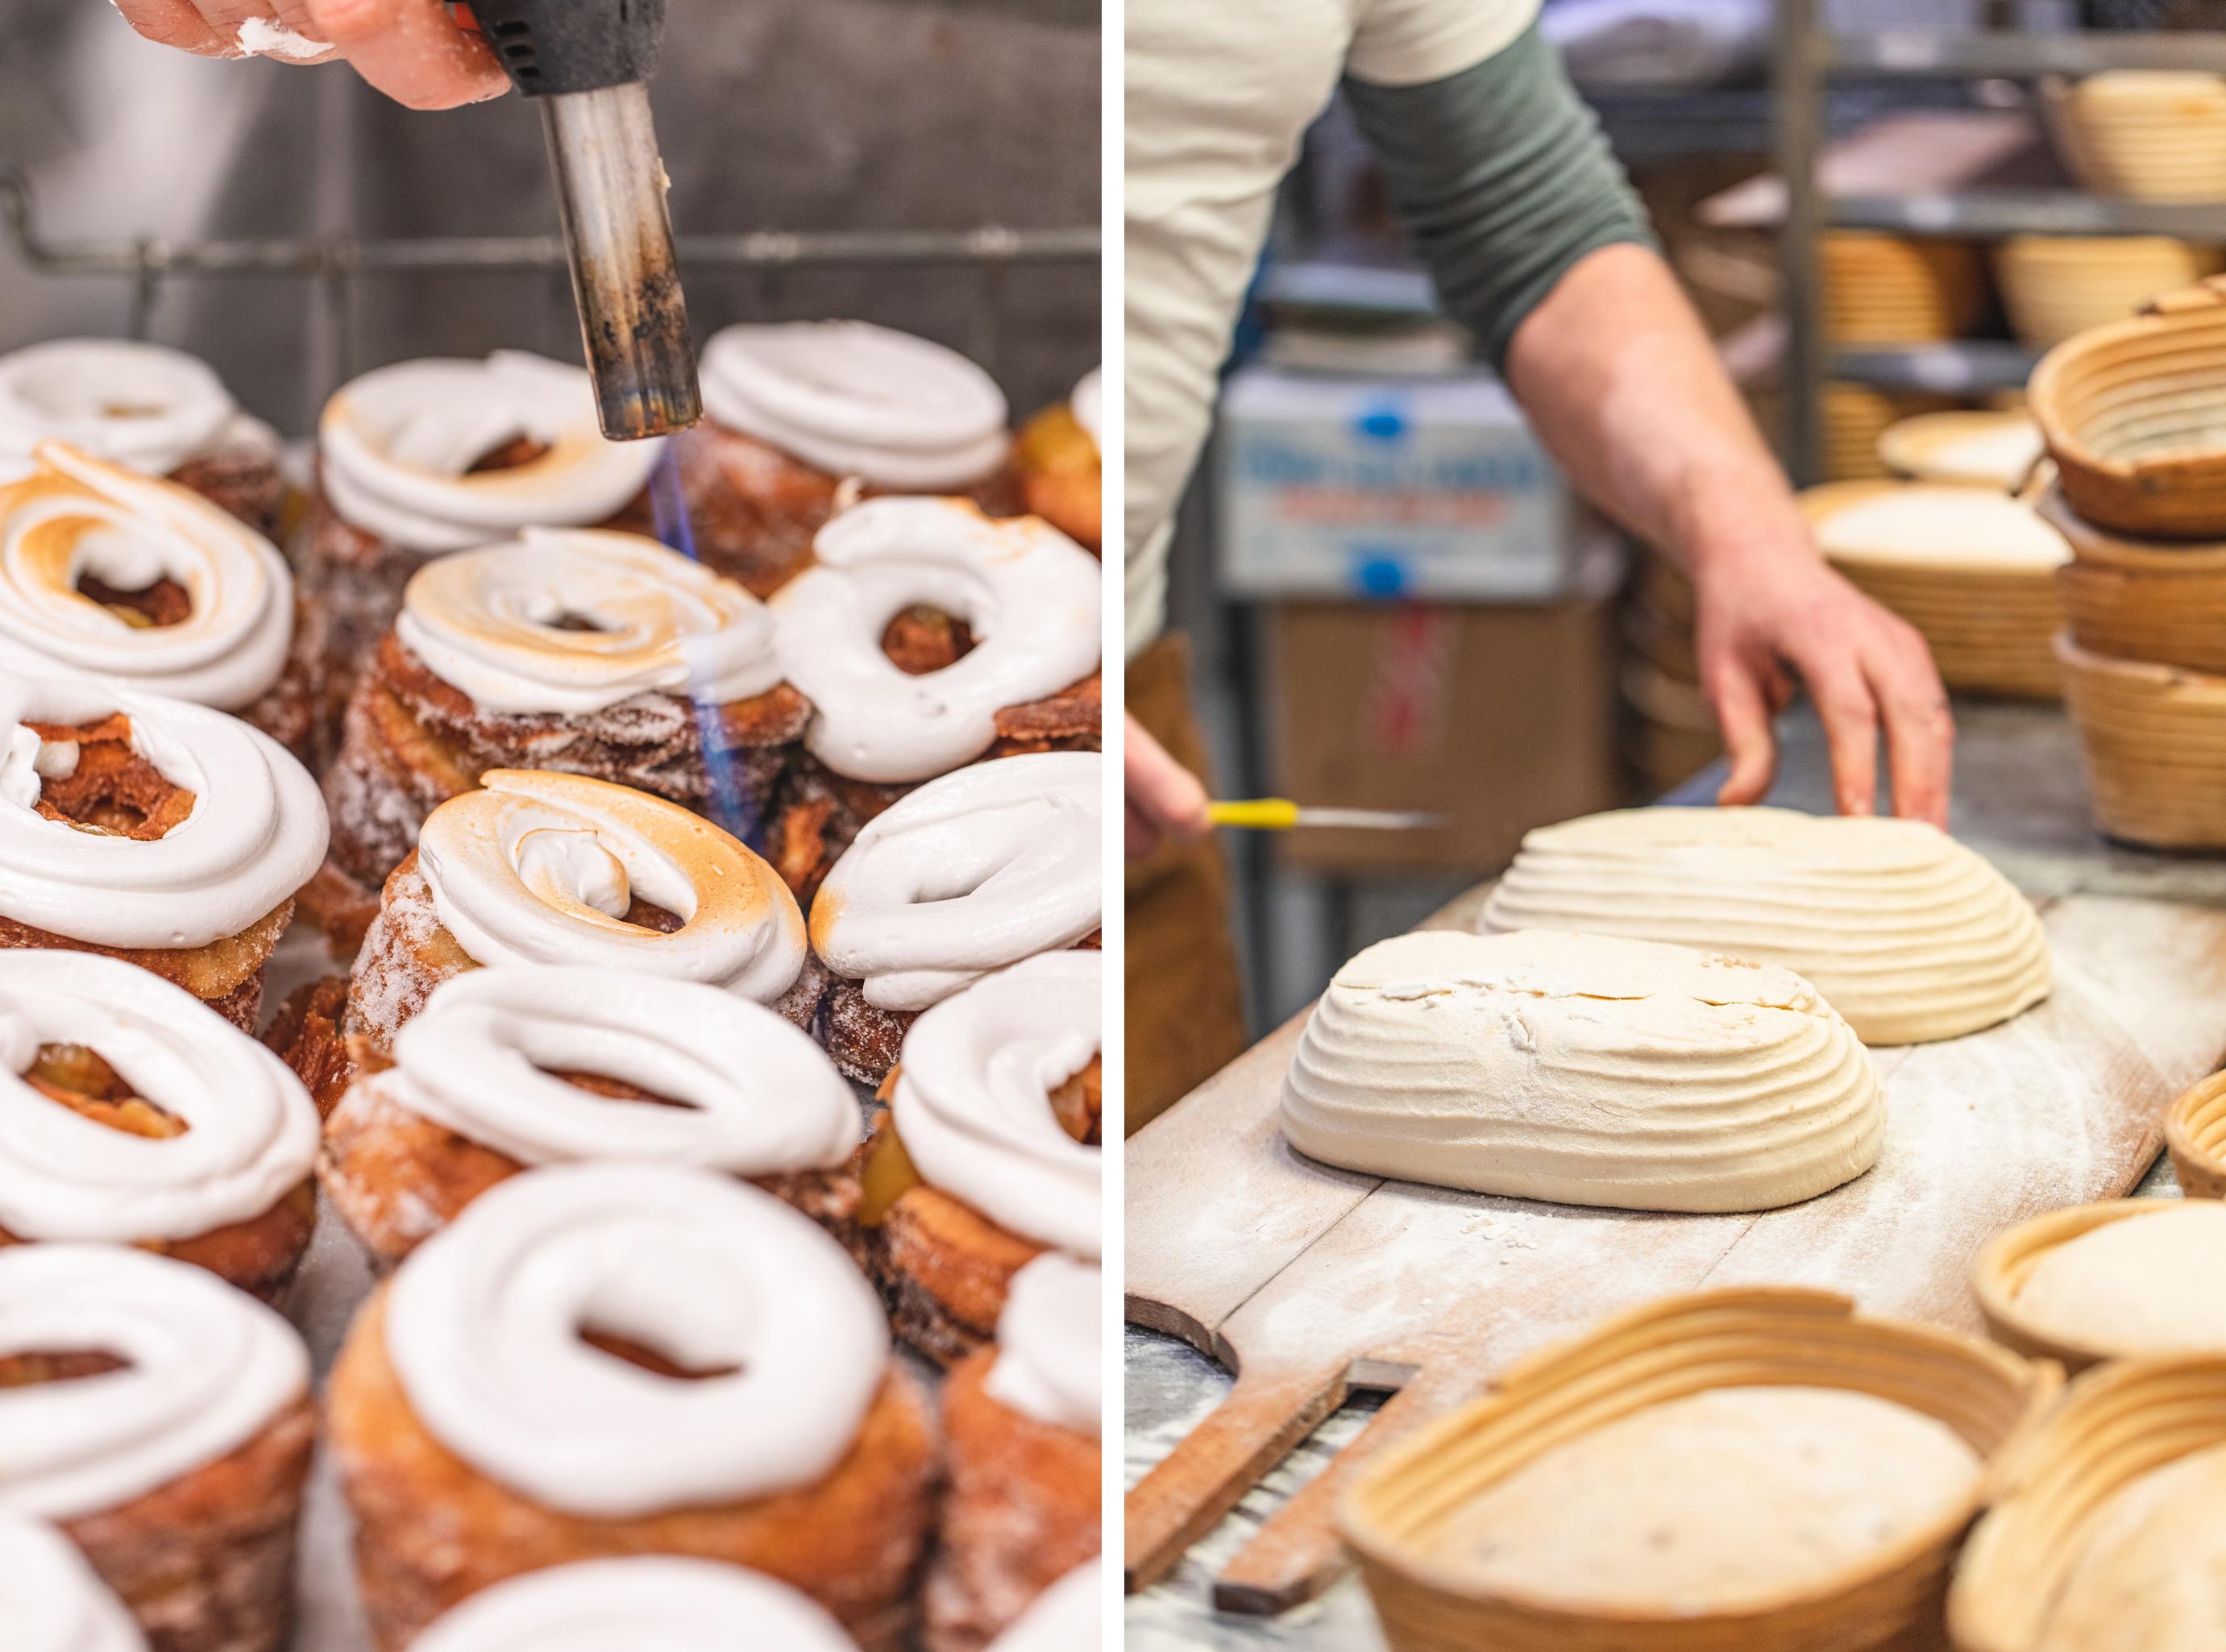 bakery process